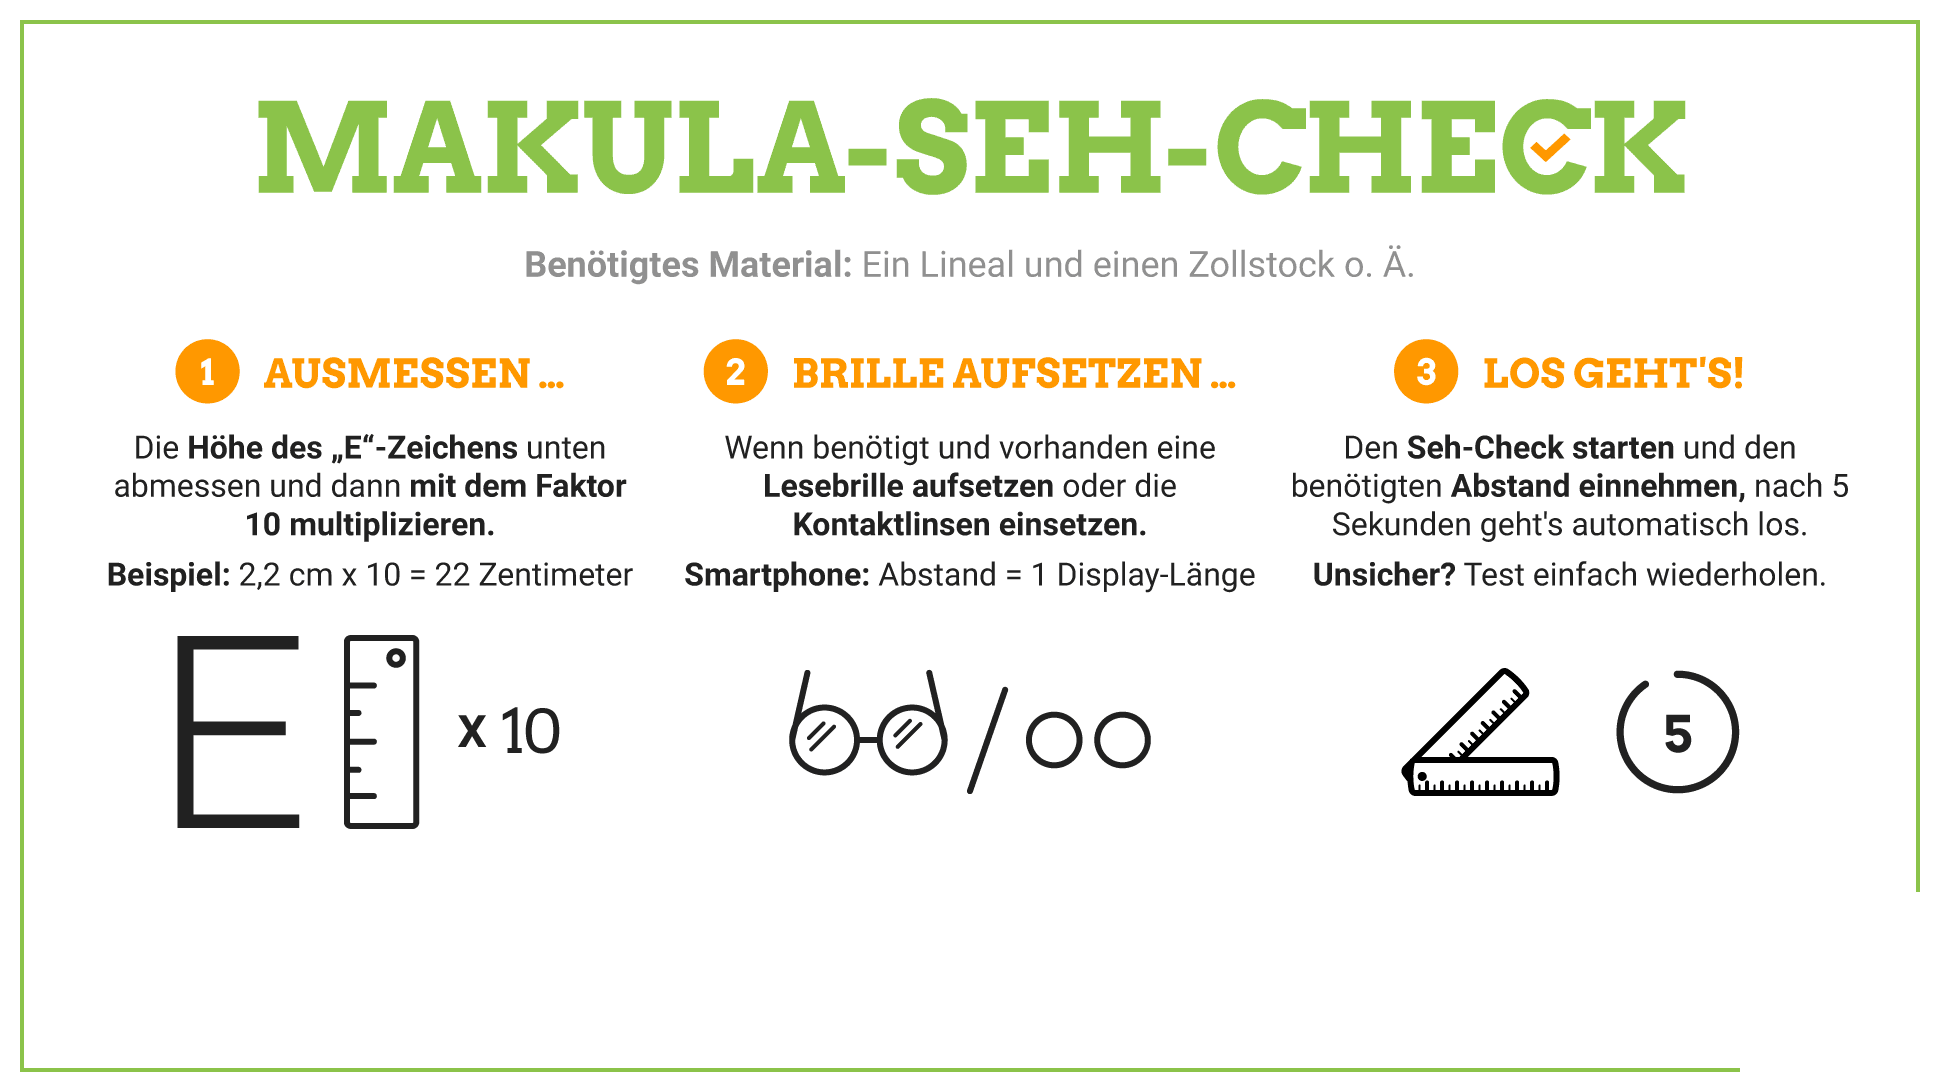 Makula-Seh-Check 01